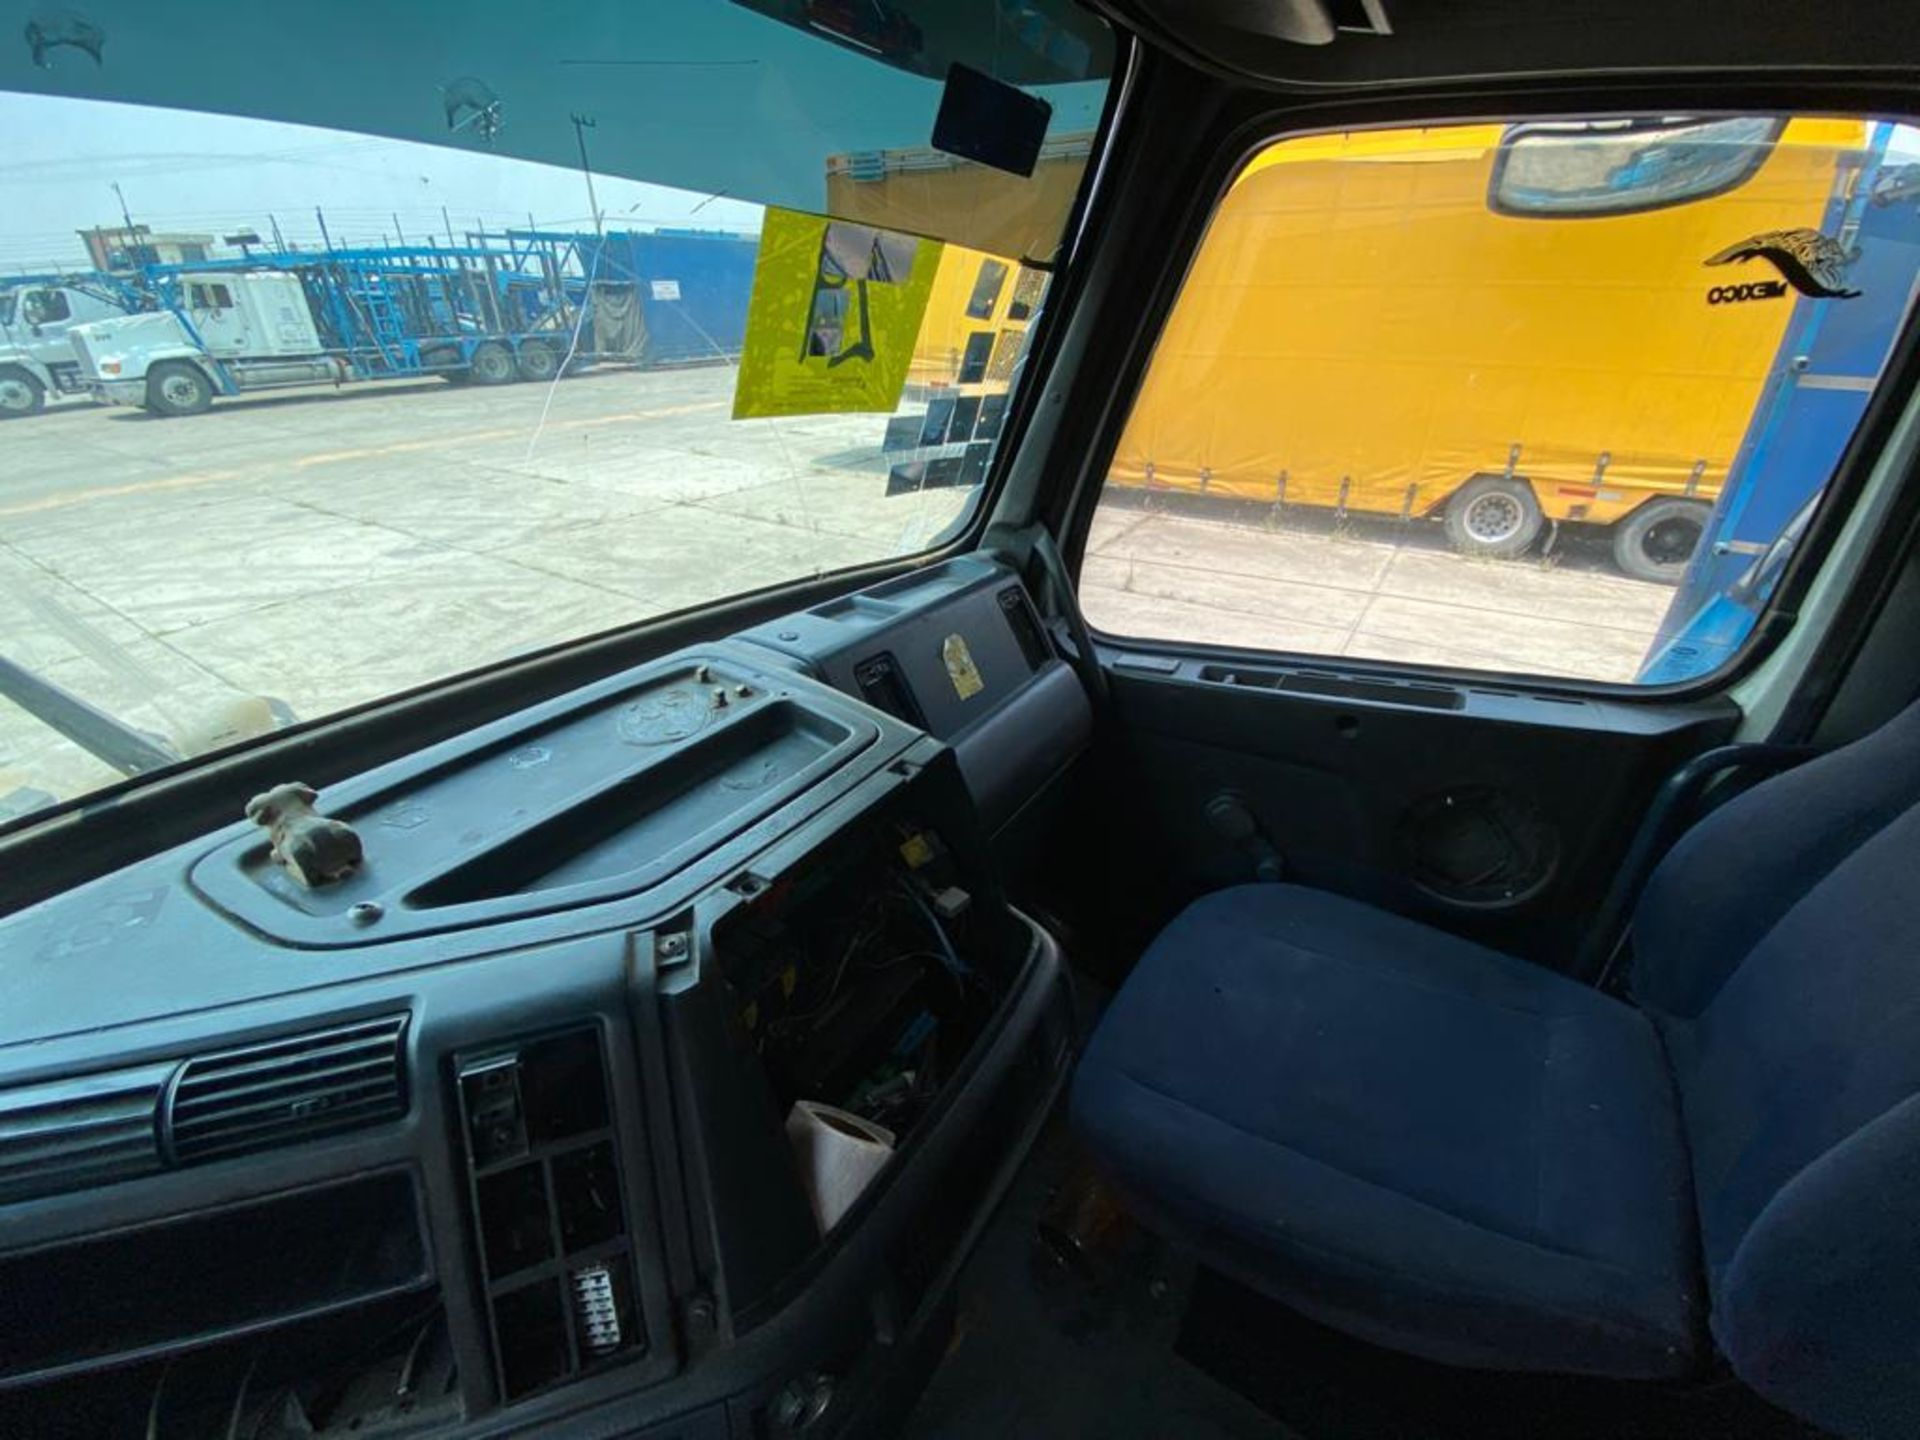 2001 Volvo Sleeper Truck Tractor, estándar transmissión of 18 speeds, with Volvo motor - Image 43 of 60